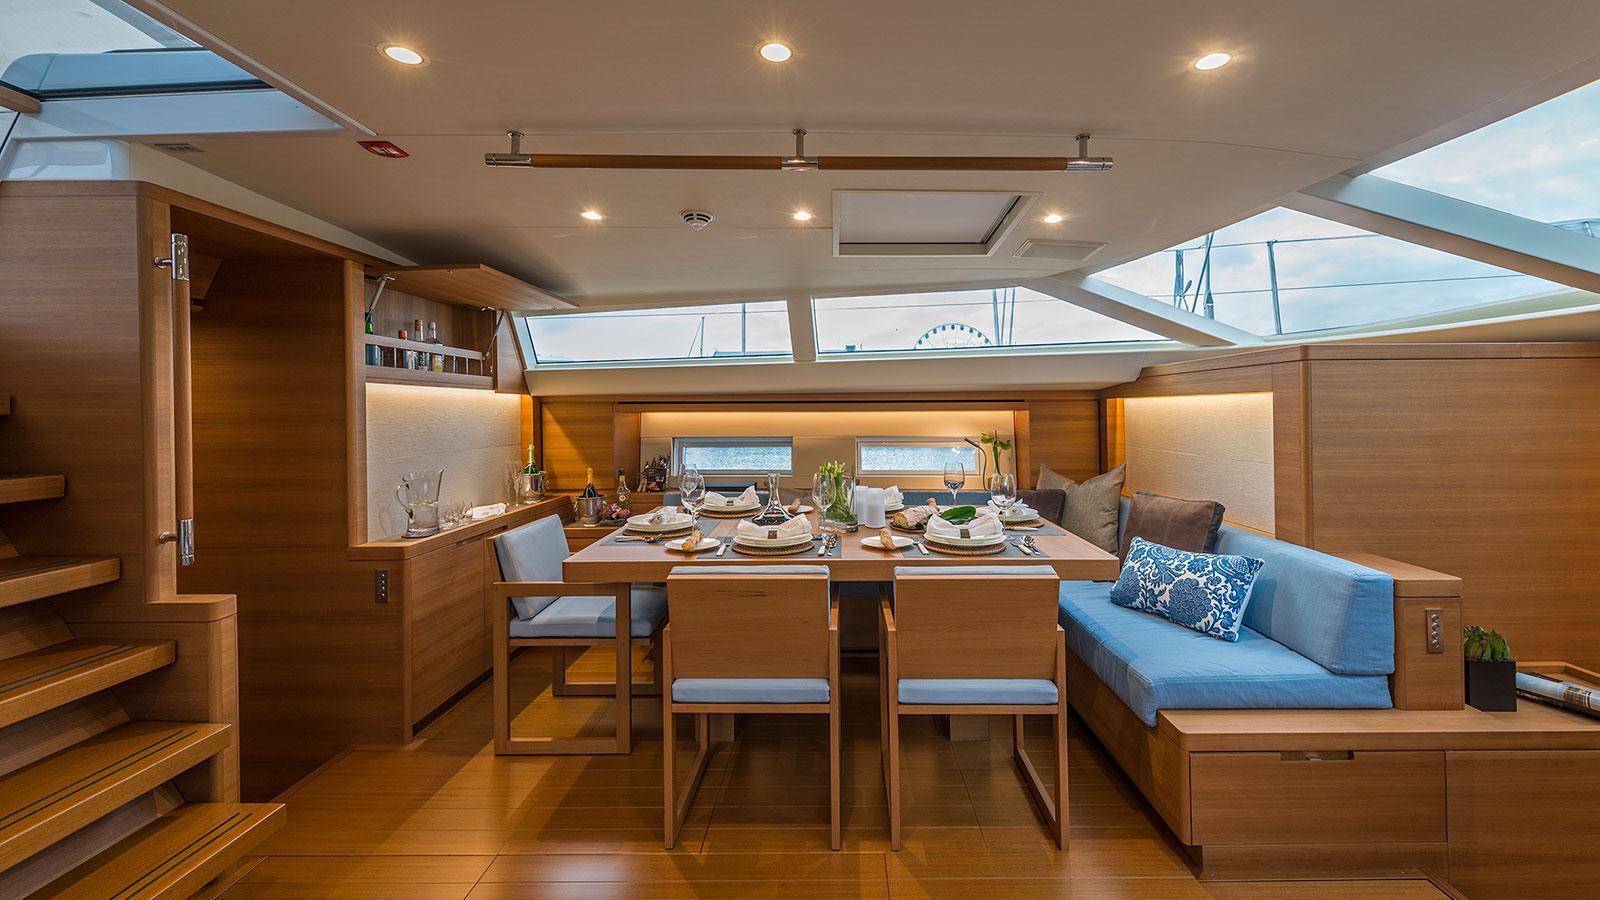 farfalla-sailing-yacht-southern-wind-2014-32m-dining-room